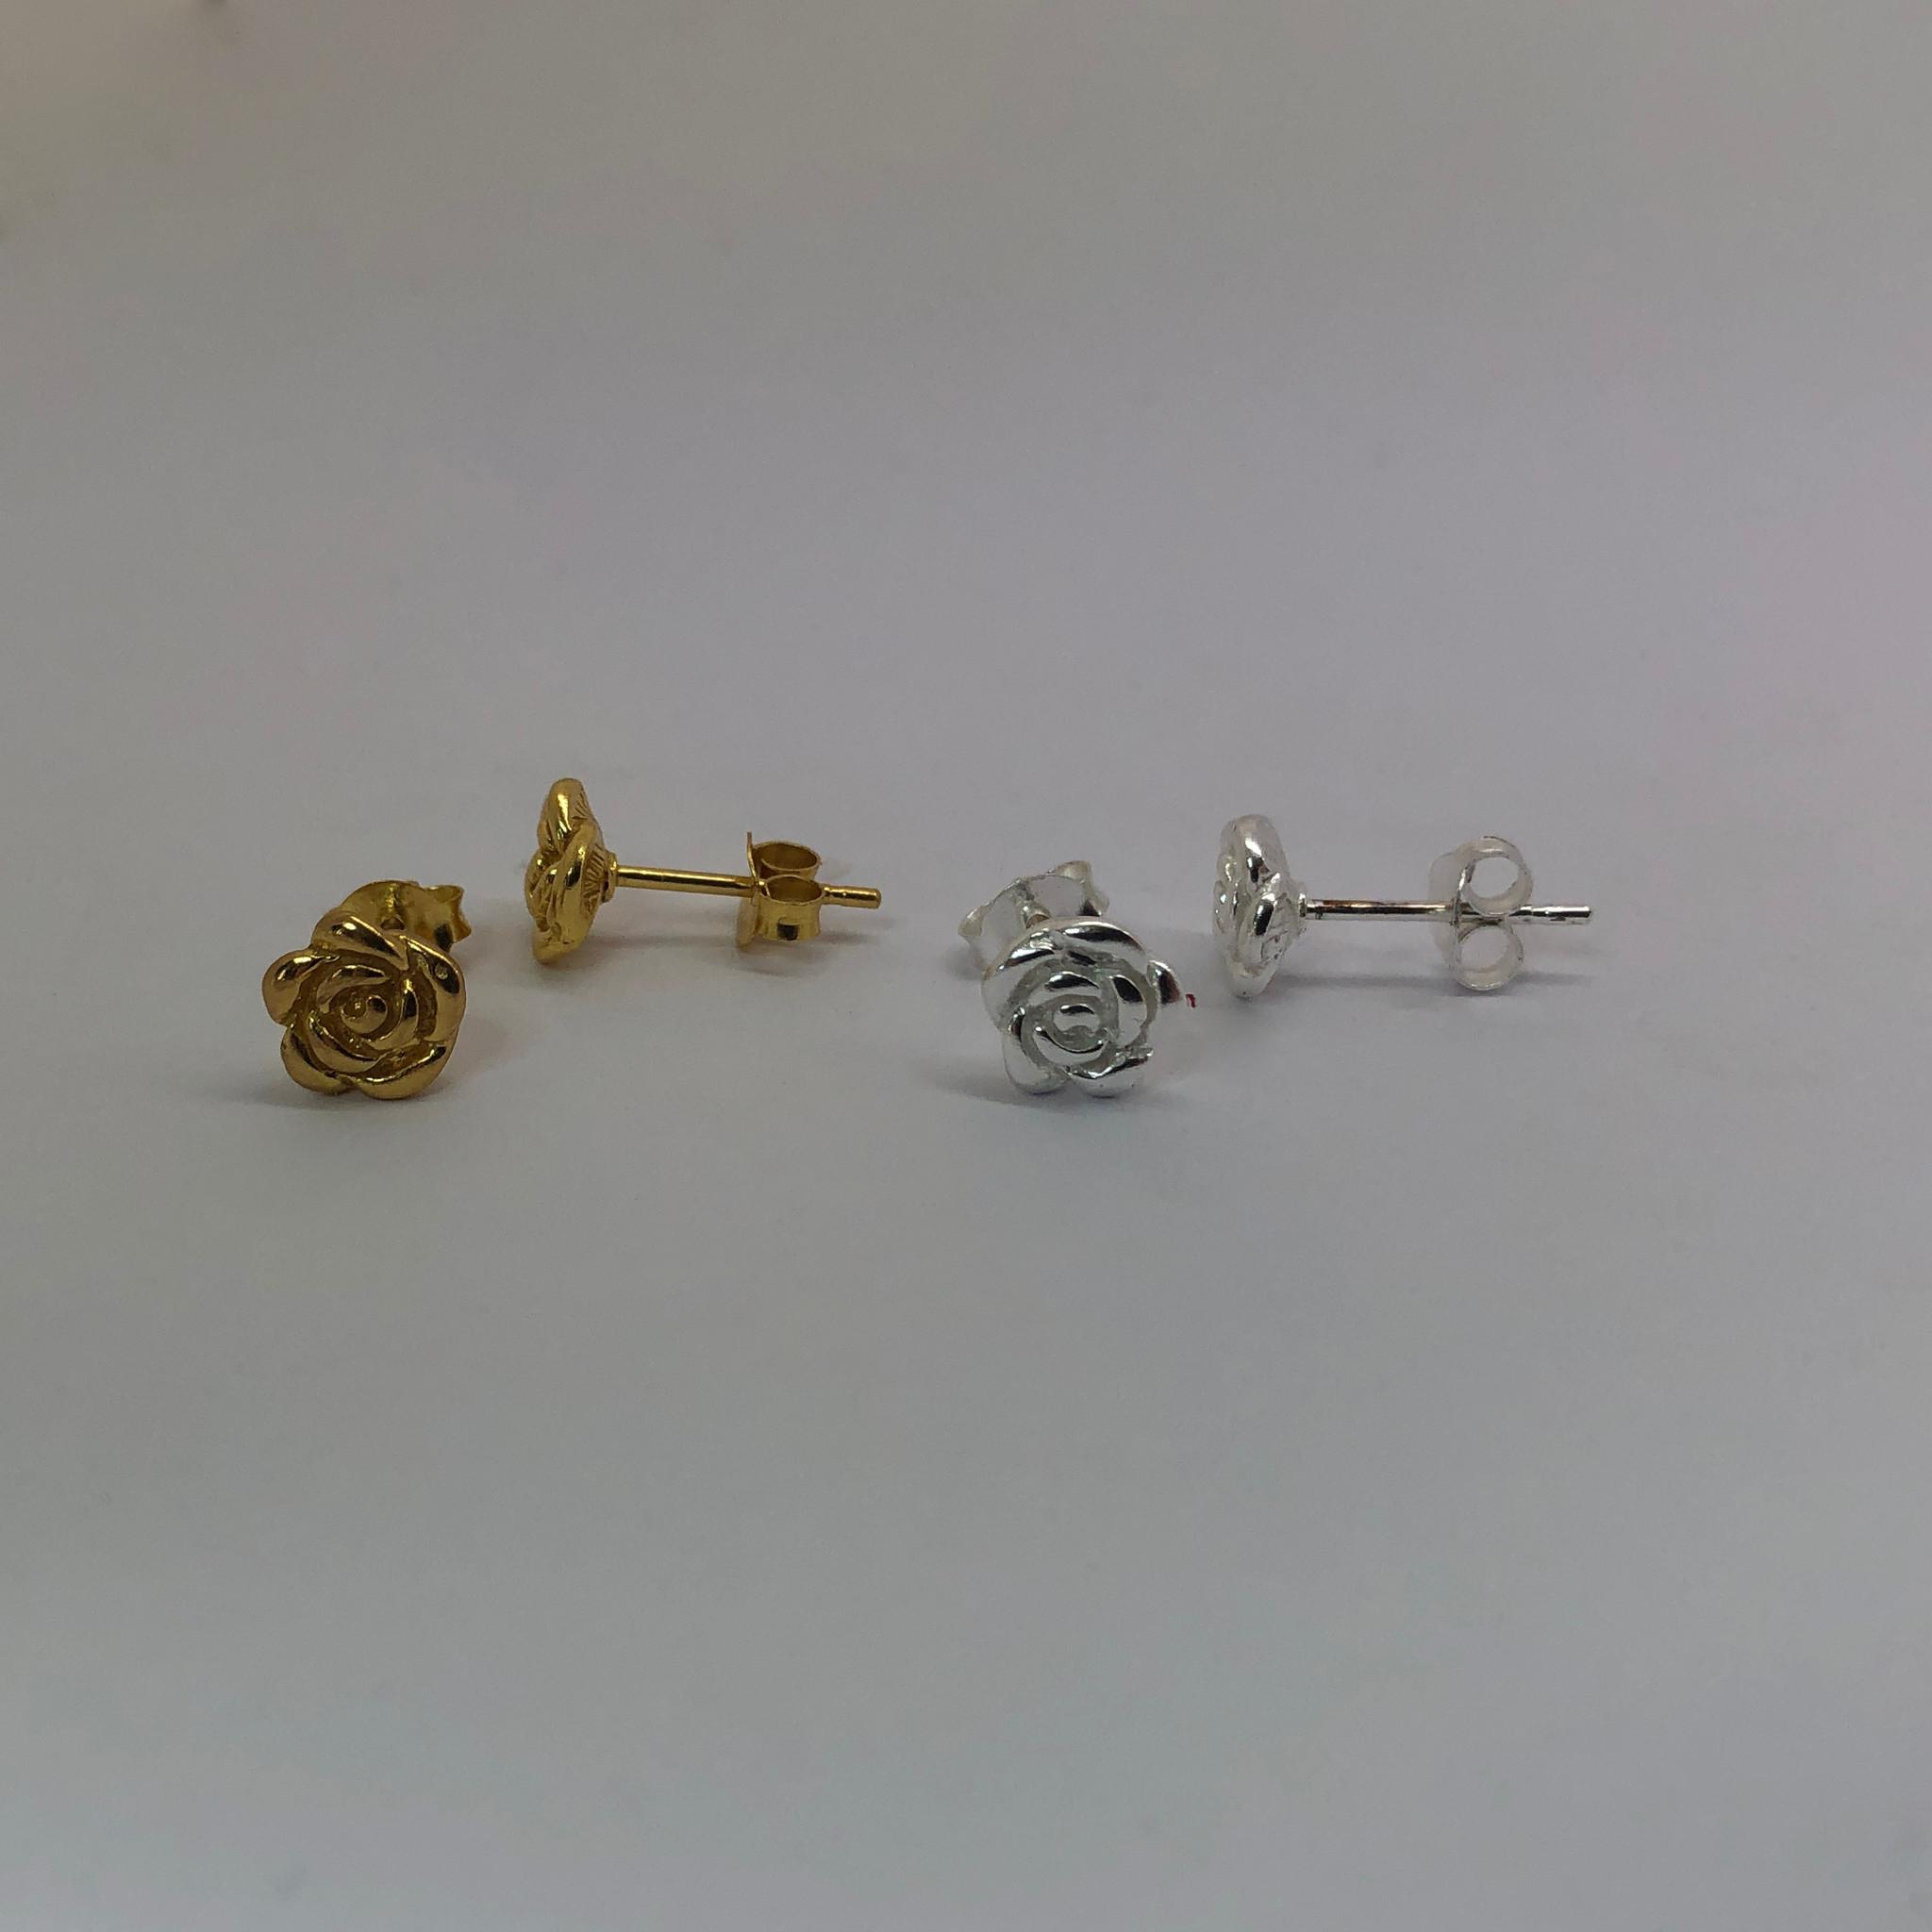 Zilver en goud op zilver setje roos oorknopjes-4